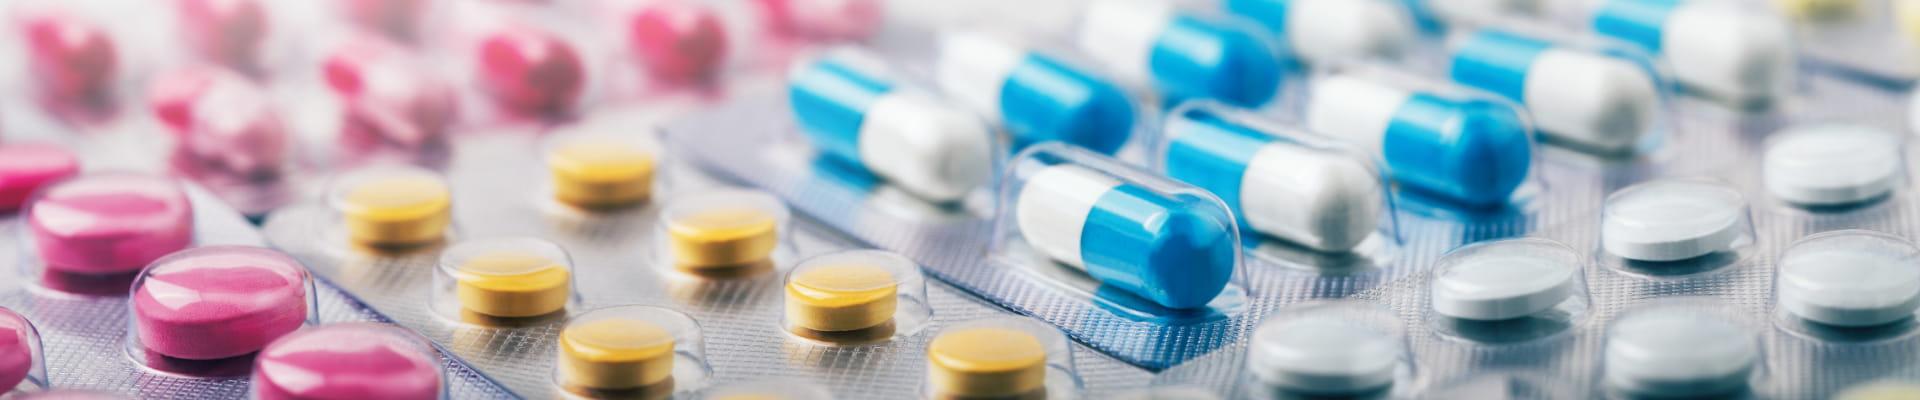 2 Outlooks on How AI Will Impact the Future of Pharma Patents